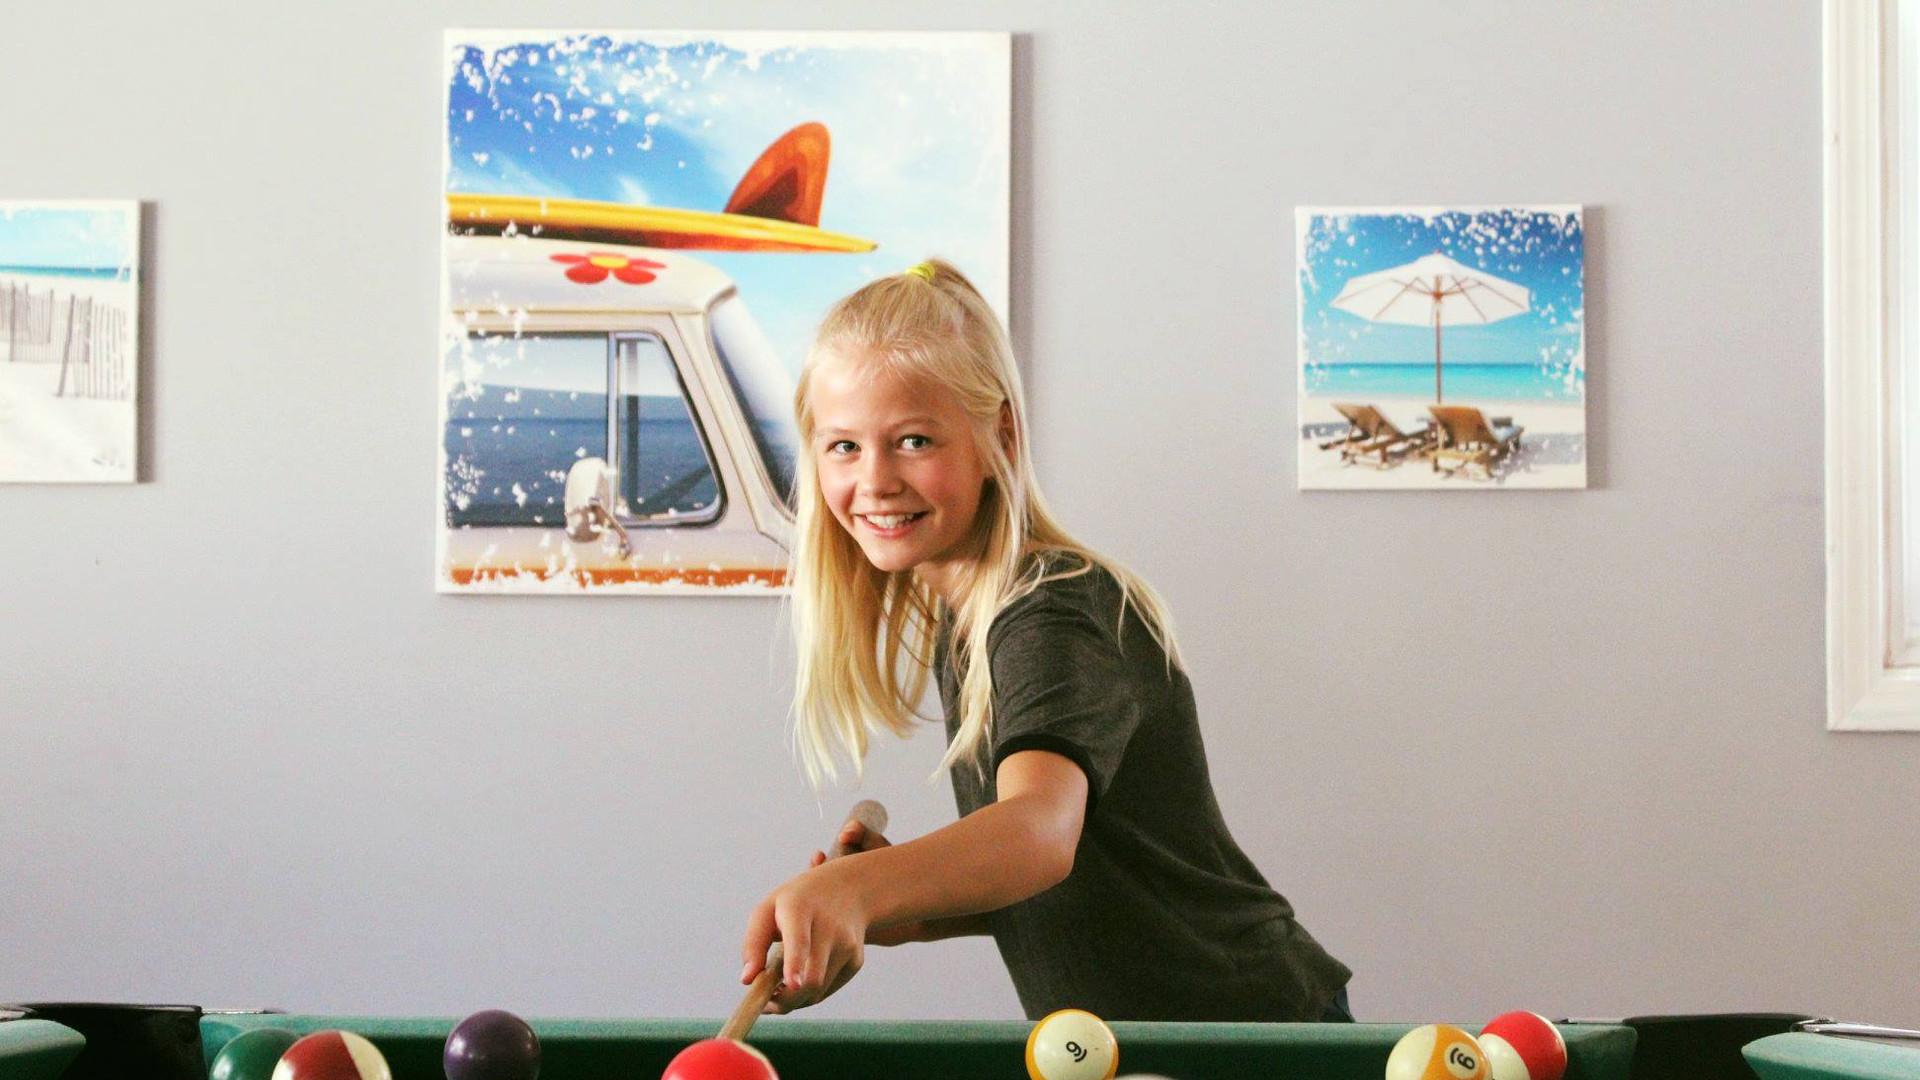 pool_billiards_room_girl-camper_Wood-Lak